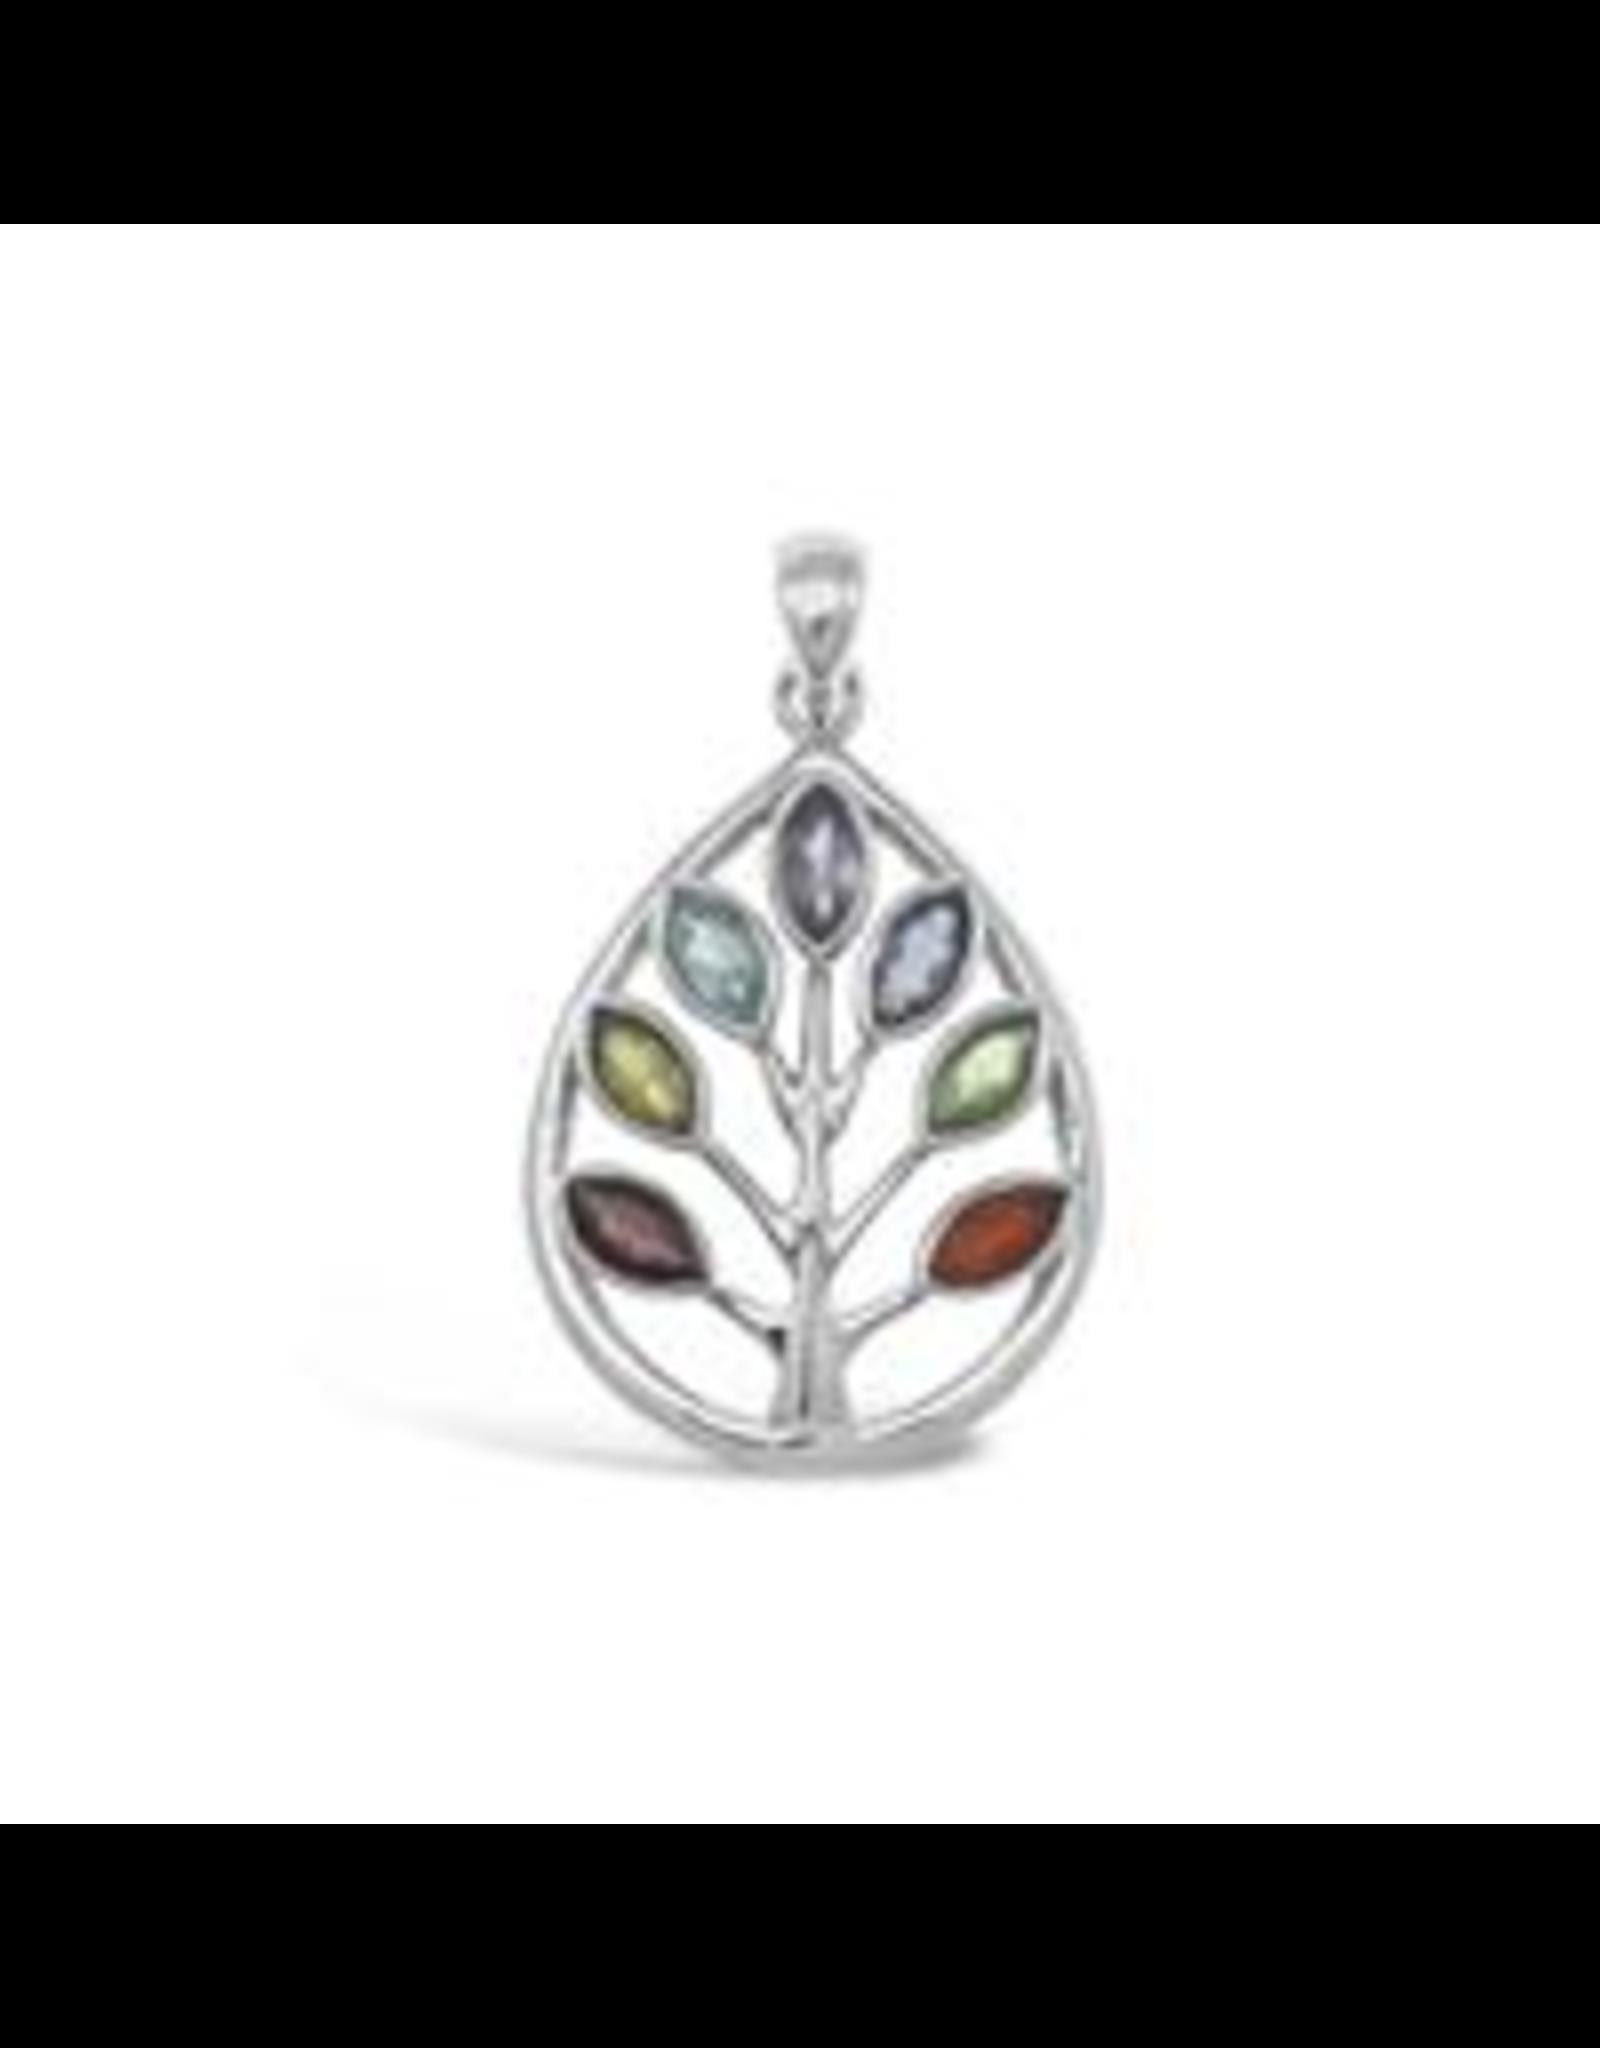 Stones & Silver Chakra Tree of Life Pendant 4cm